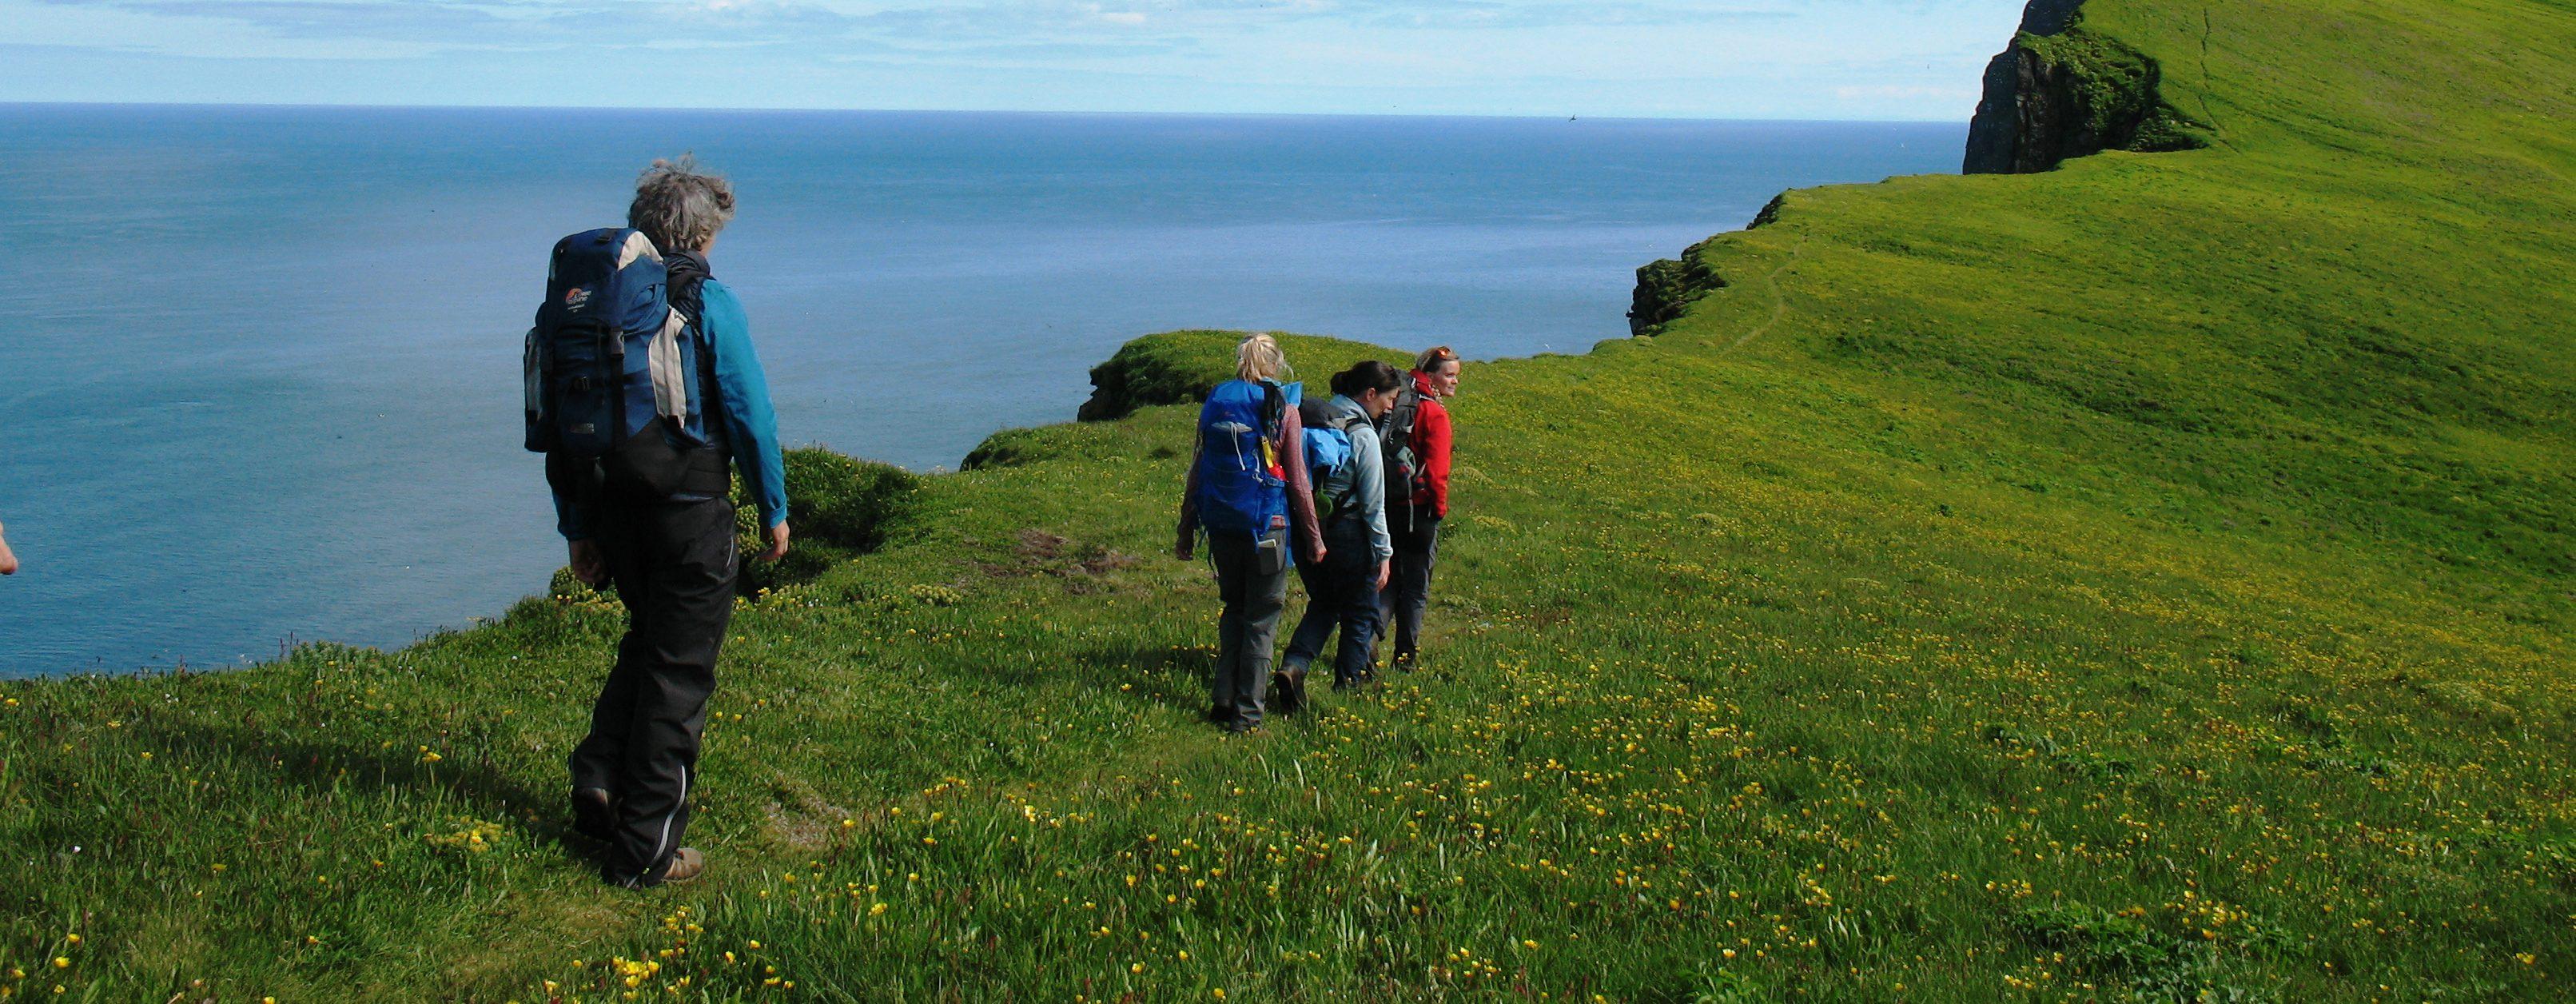 Wanderer vor einem markanten Berg im Naturreservat Hornstrandir, satt grüne Wiesen